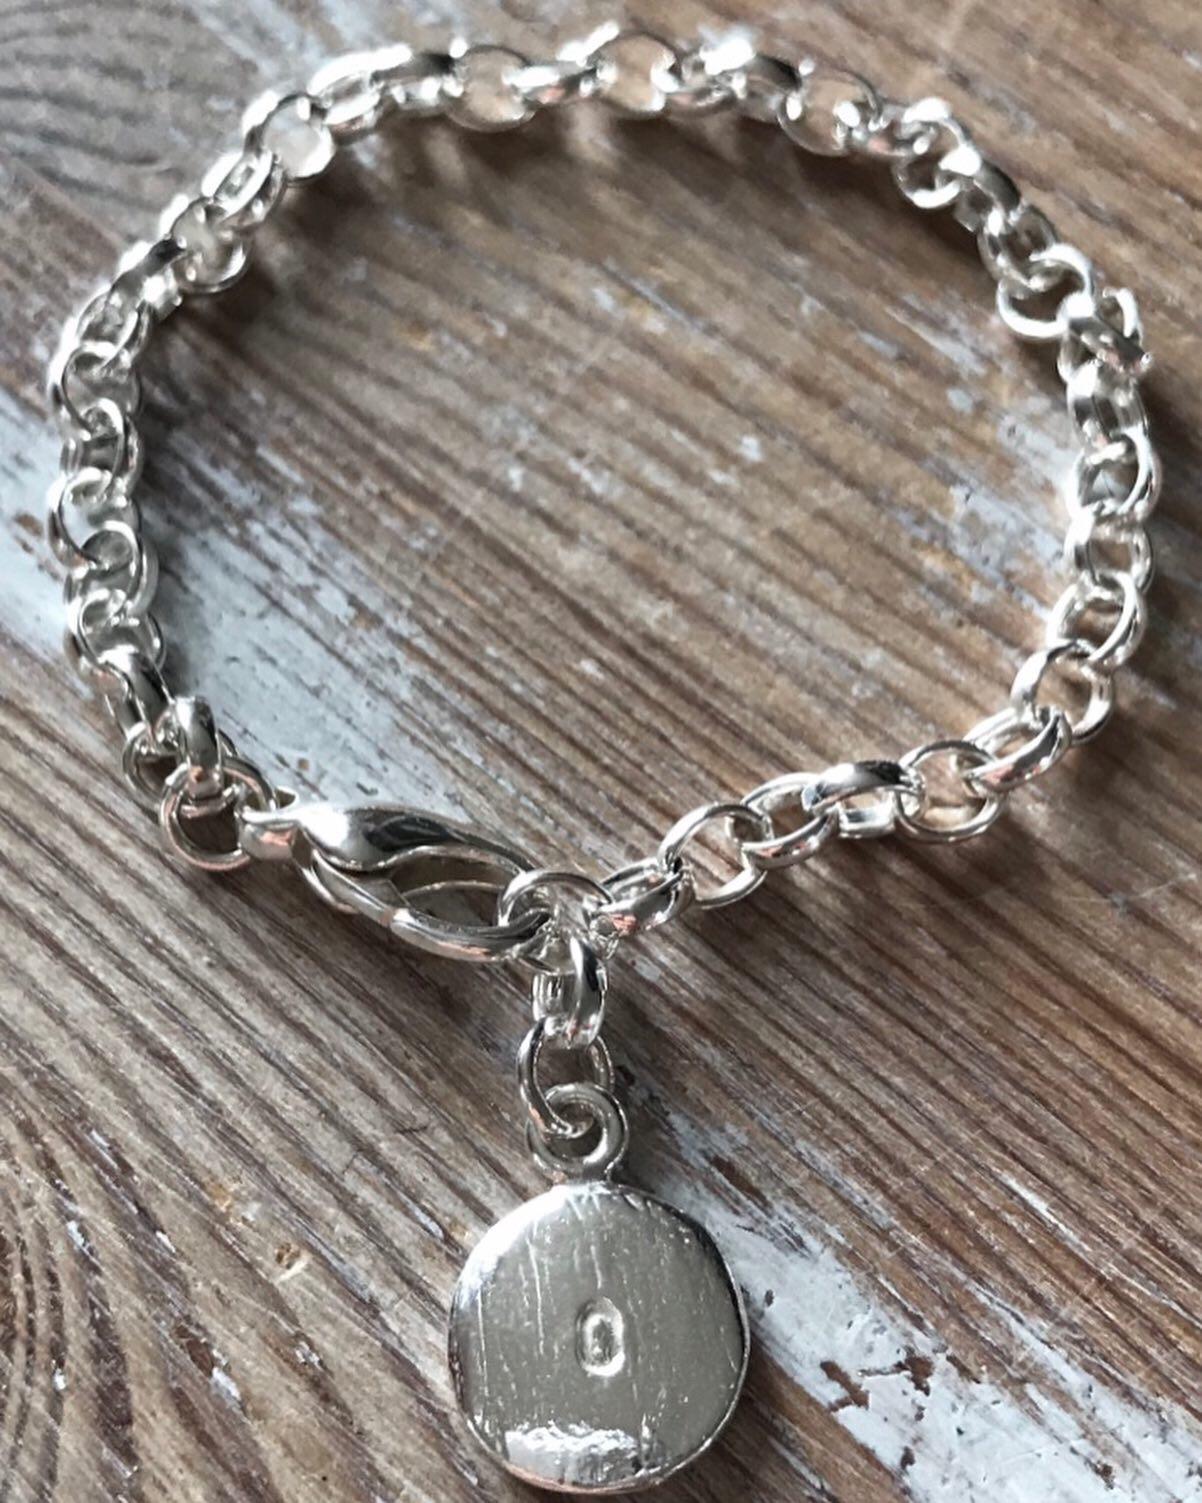 b2560421ec443 Simple Charm Bracelet — Stella & Stokes | Bespoke Handmade Jewellery